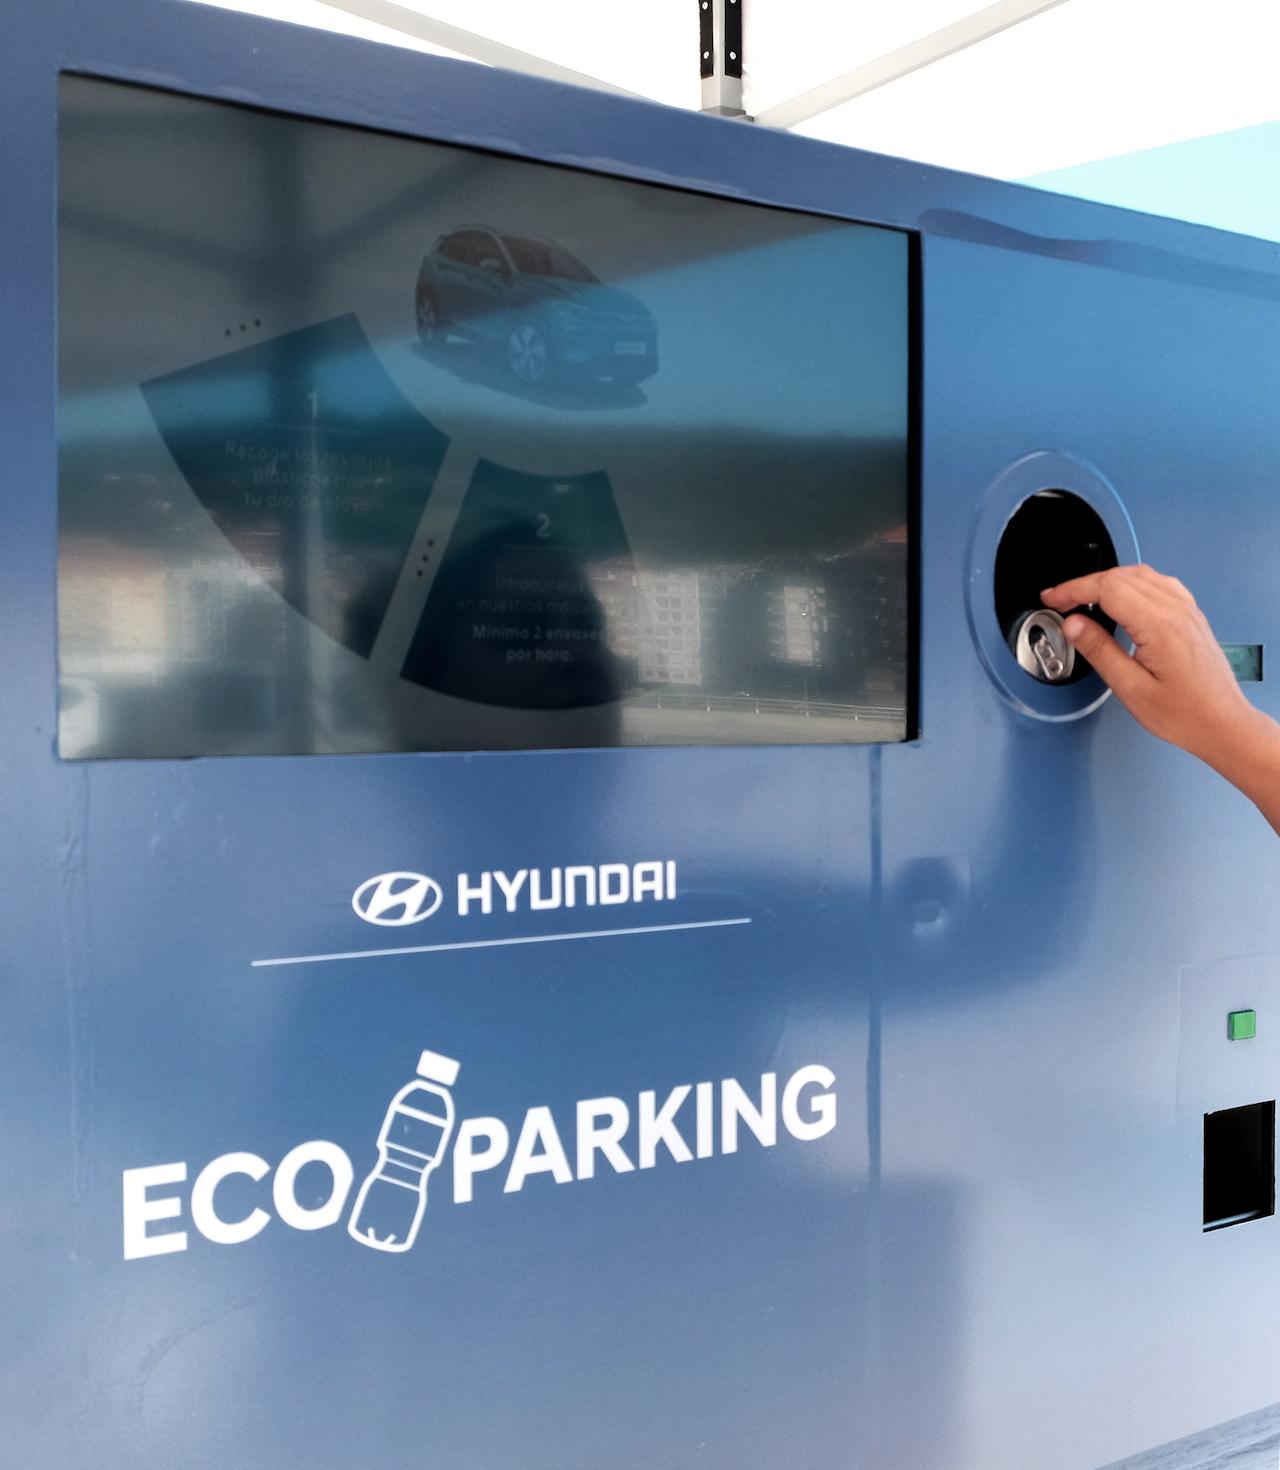 hyundai-eco-parking-reciclando-2